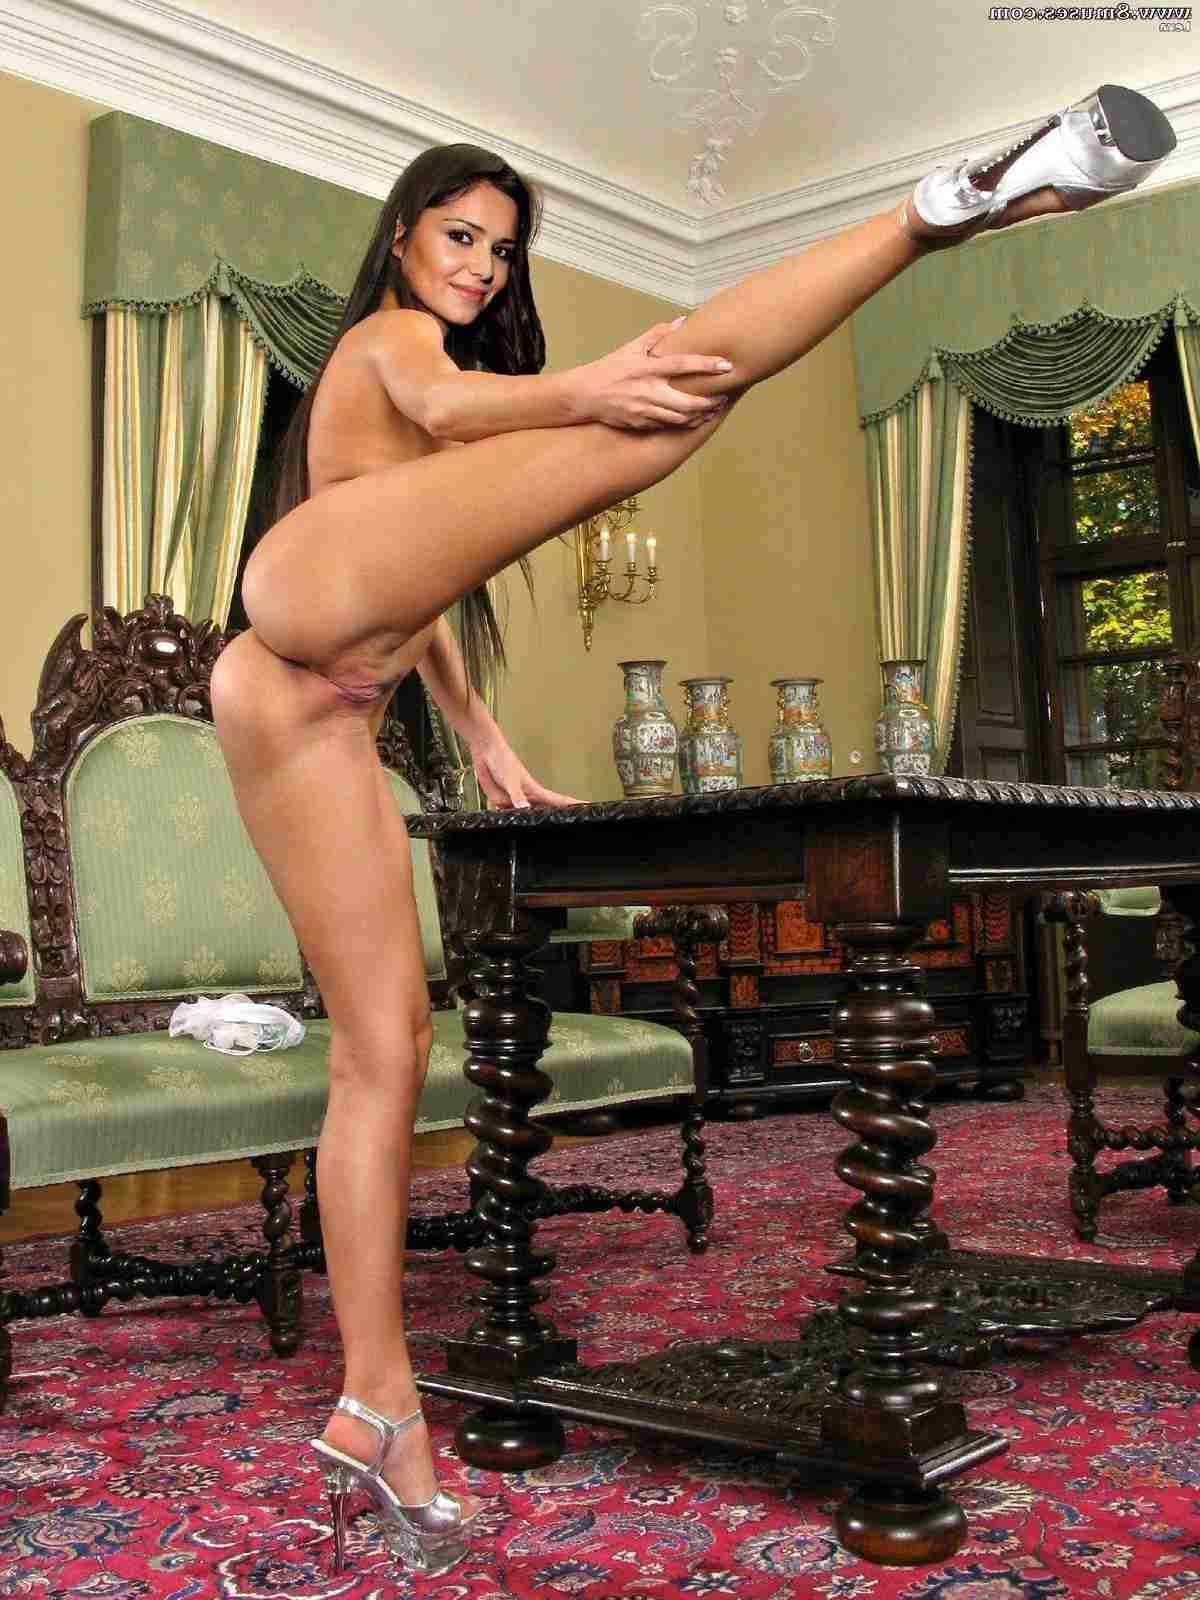 Fake-Celebrities-Sex-Pictures/Cheryl-Tweedy Cheryl__Tweedy__8muses_-_Sex_and_Porn_Comics_87.jpg